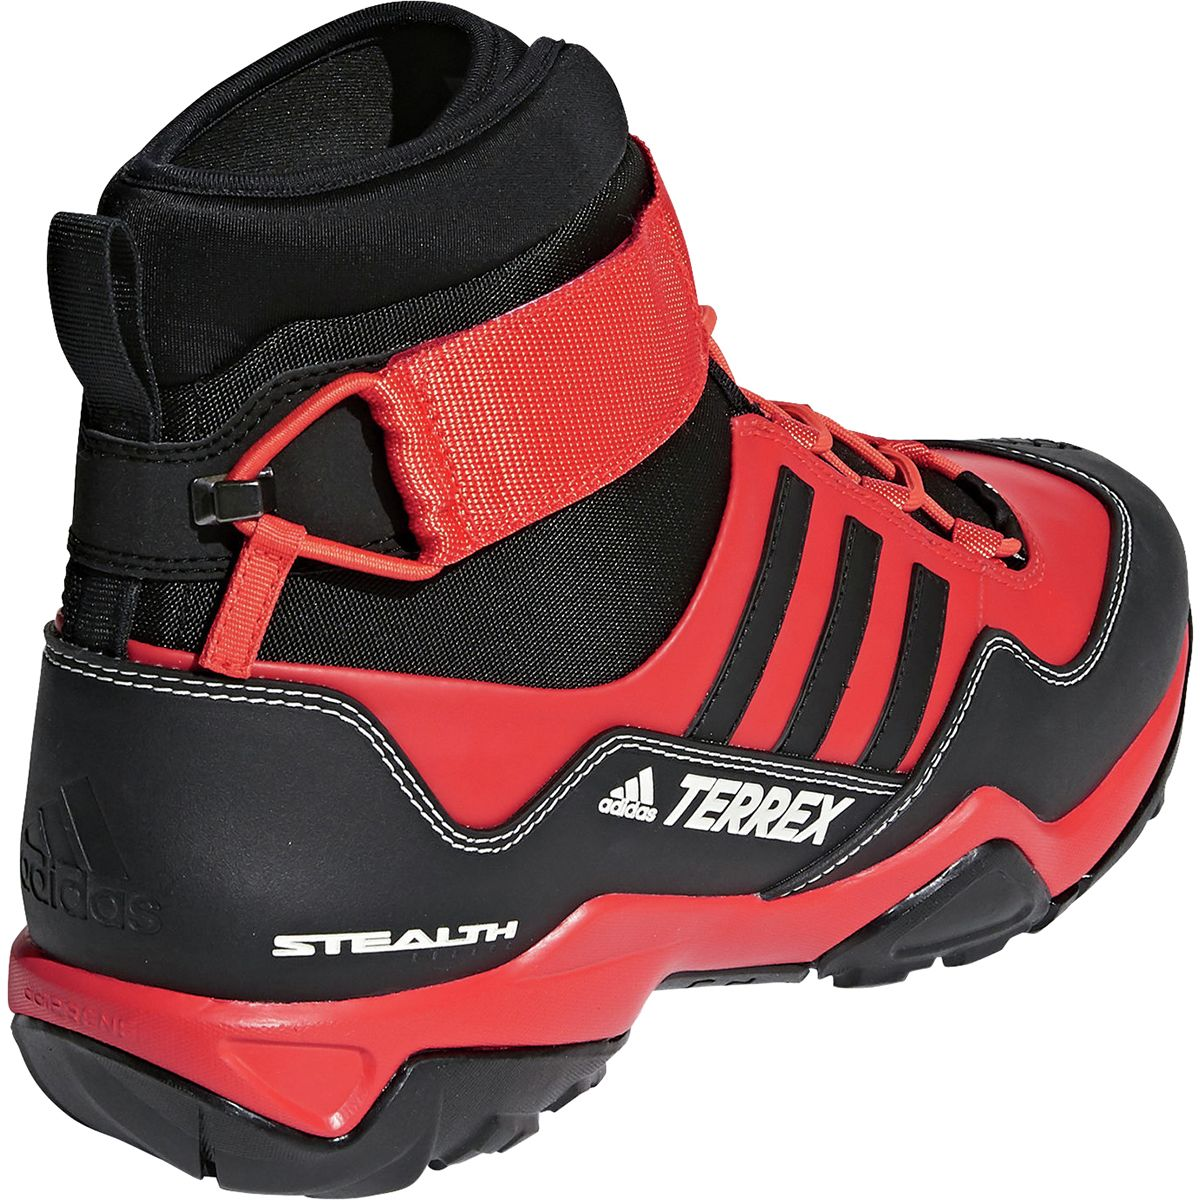 Adidas Outdoor Terrex Hydro-Lace Water Shoe - Men's   Backcountry.com